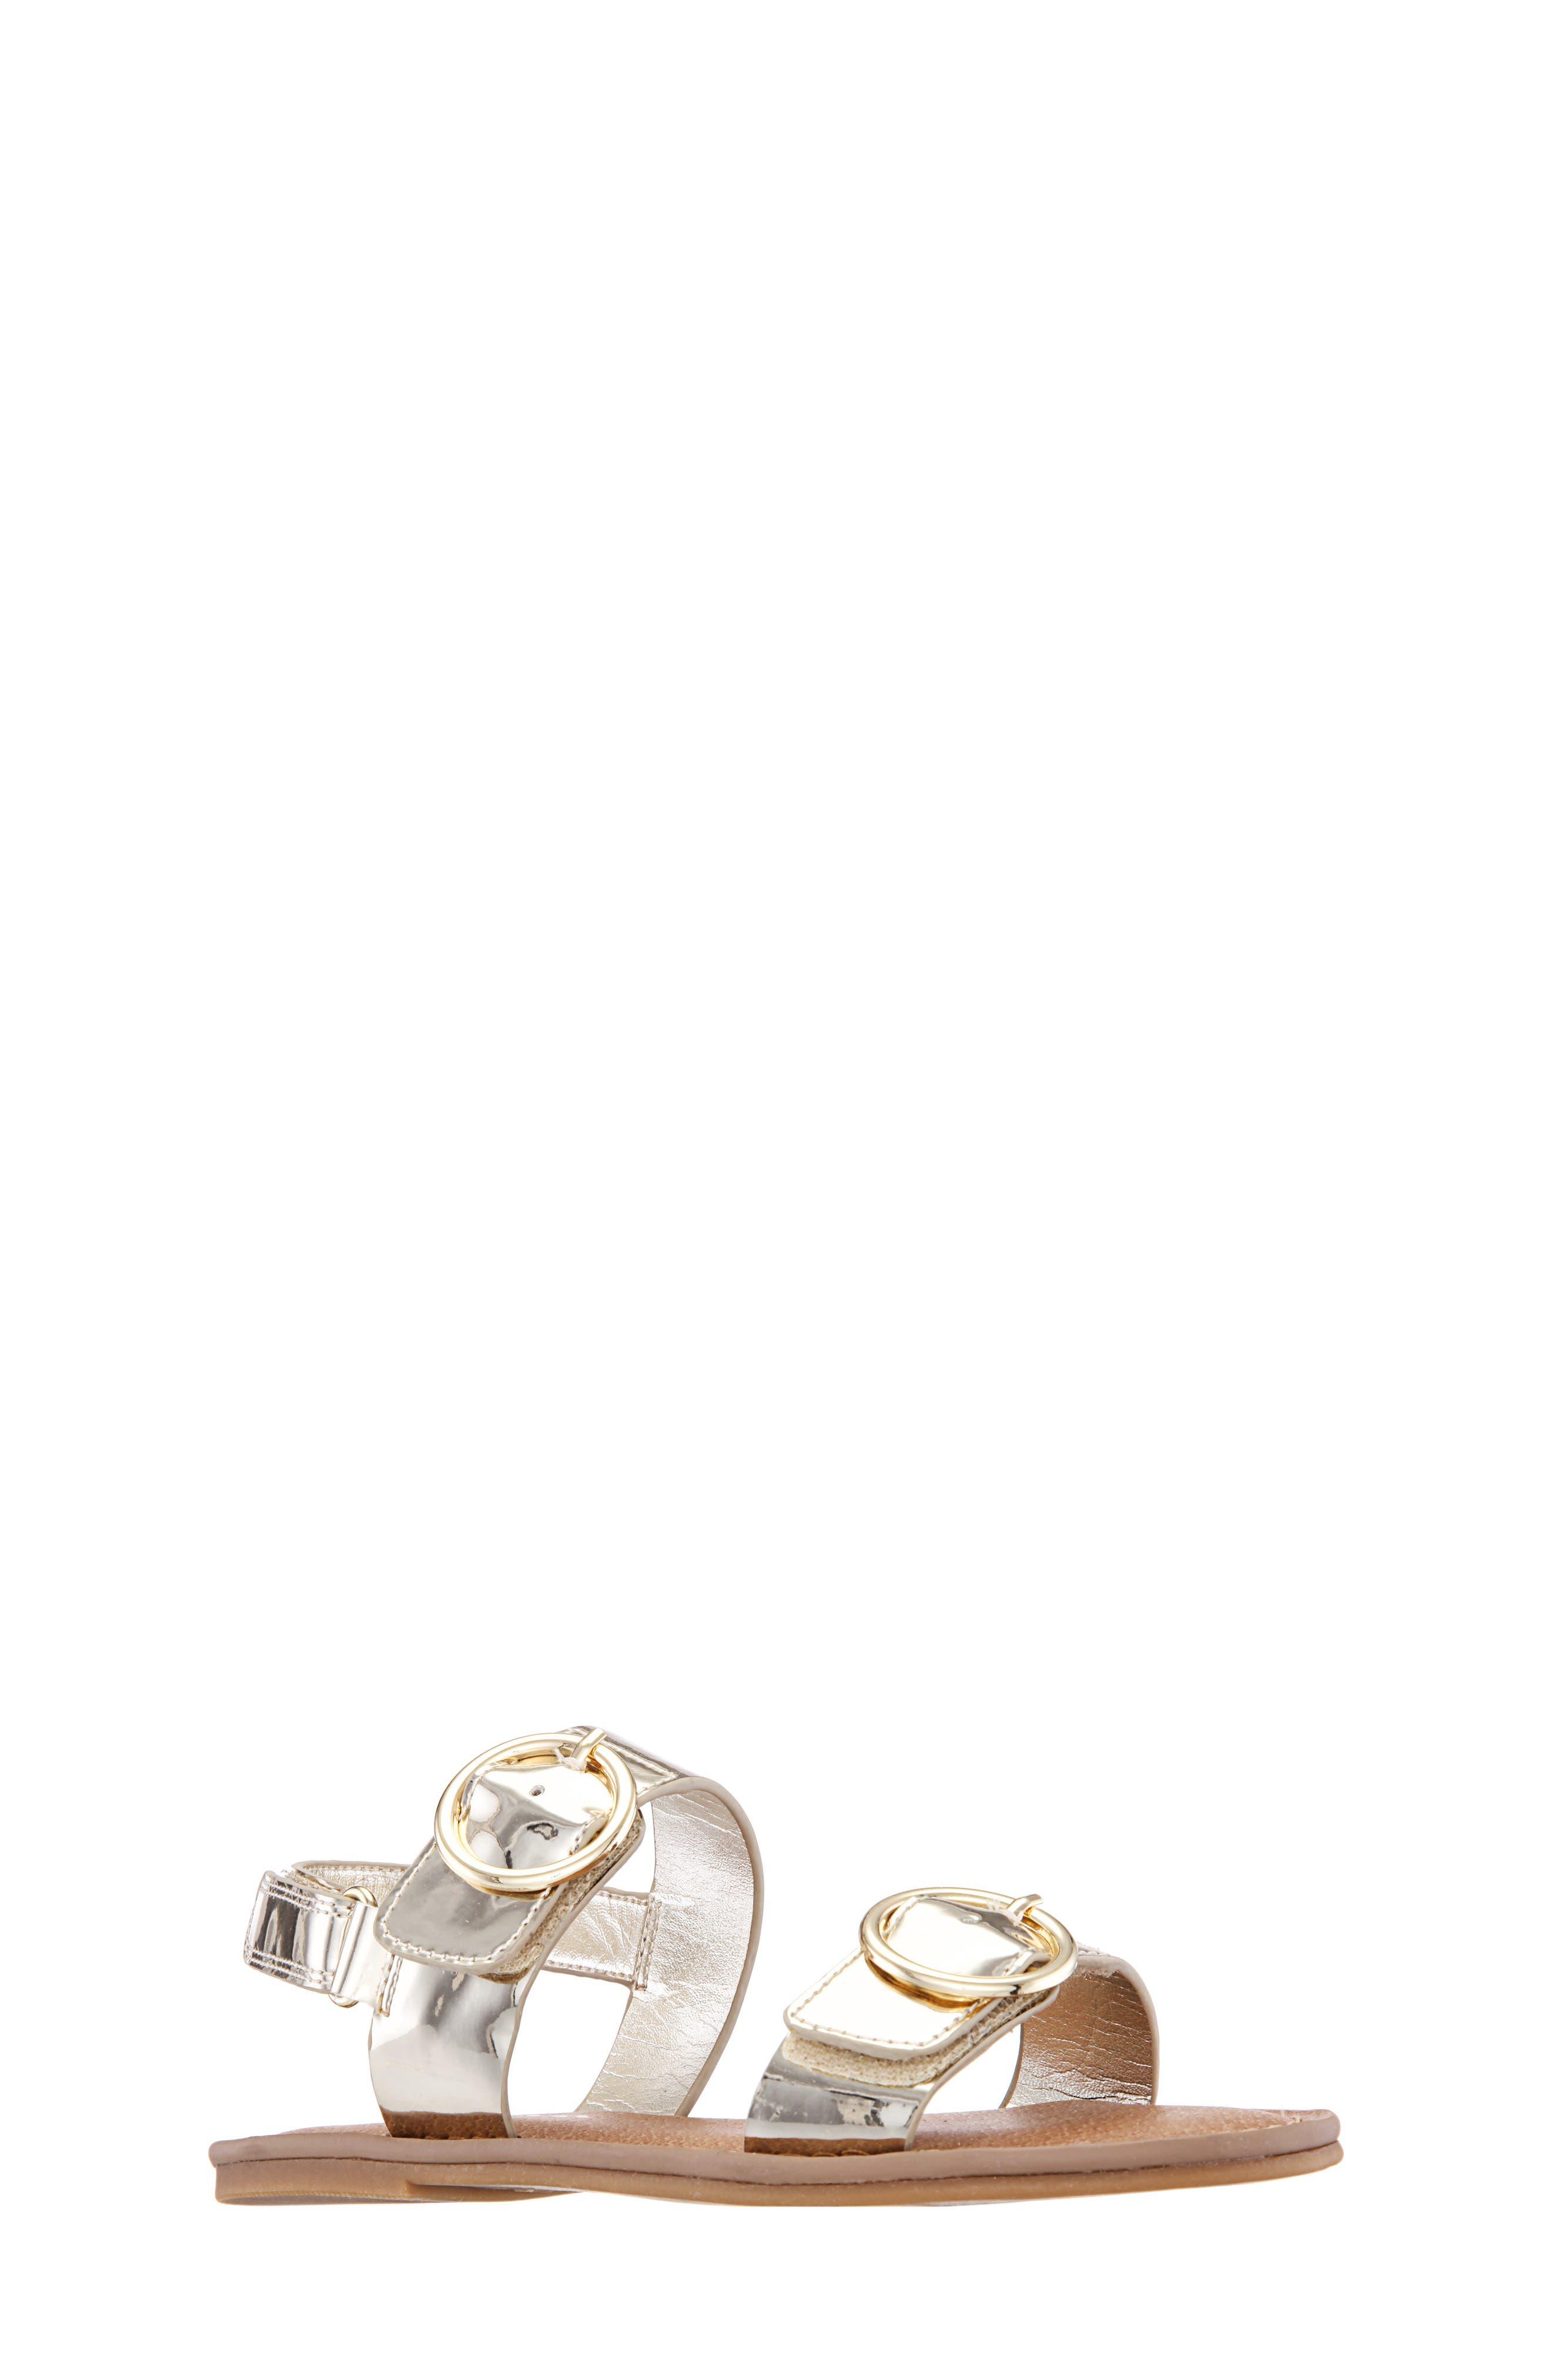 Girls Nina Brunny Sandal Size 5 M  Metallic